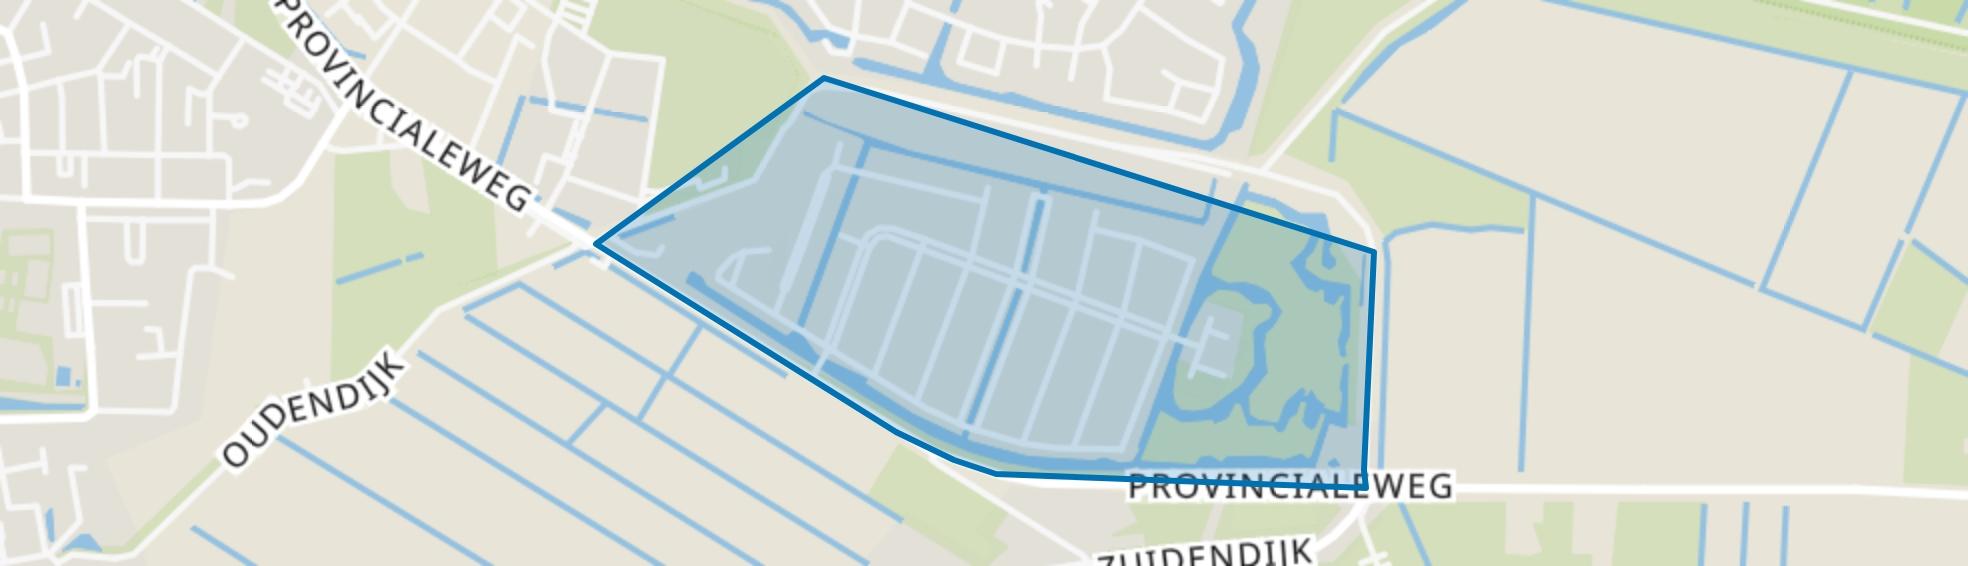 De Hoven, Dordrecht map